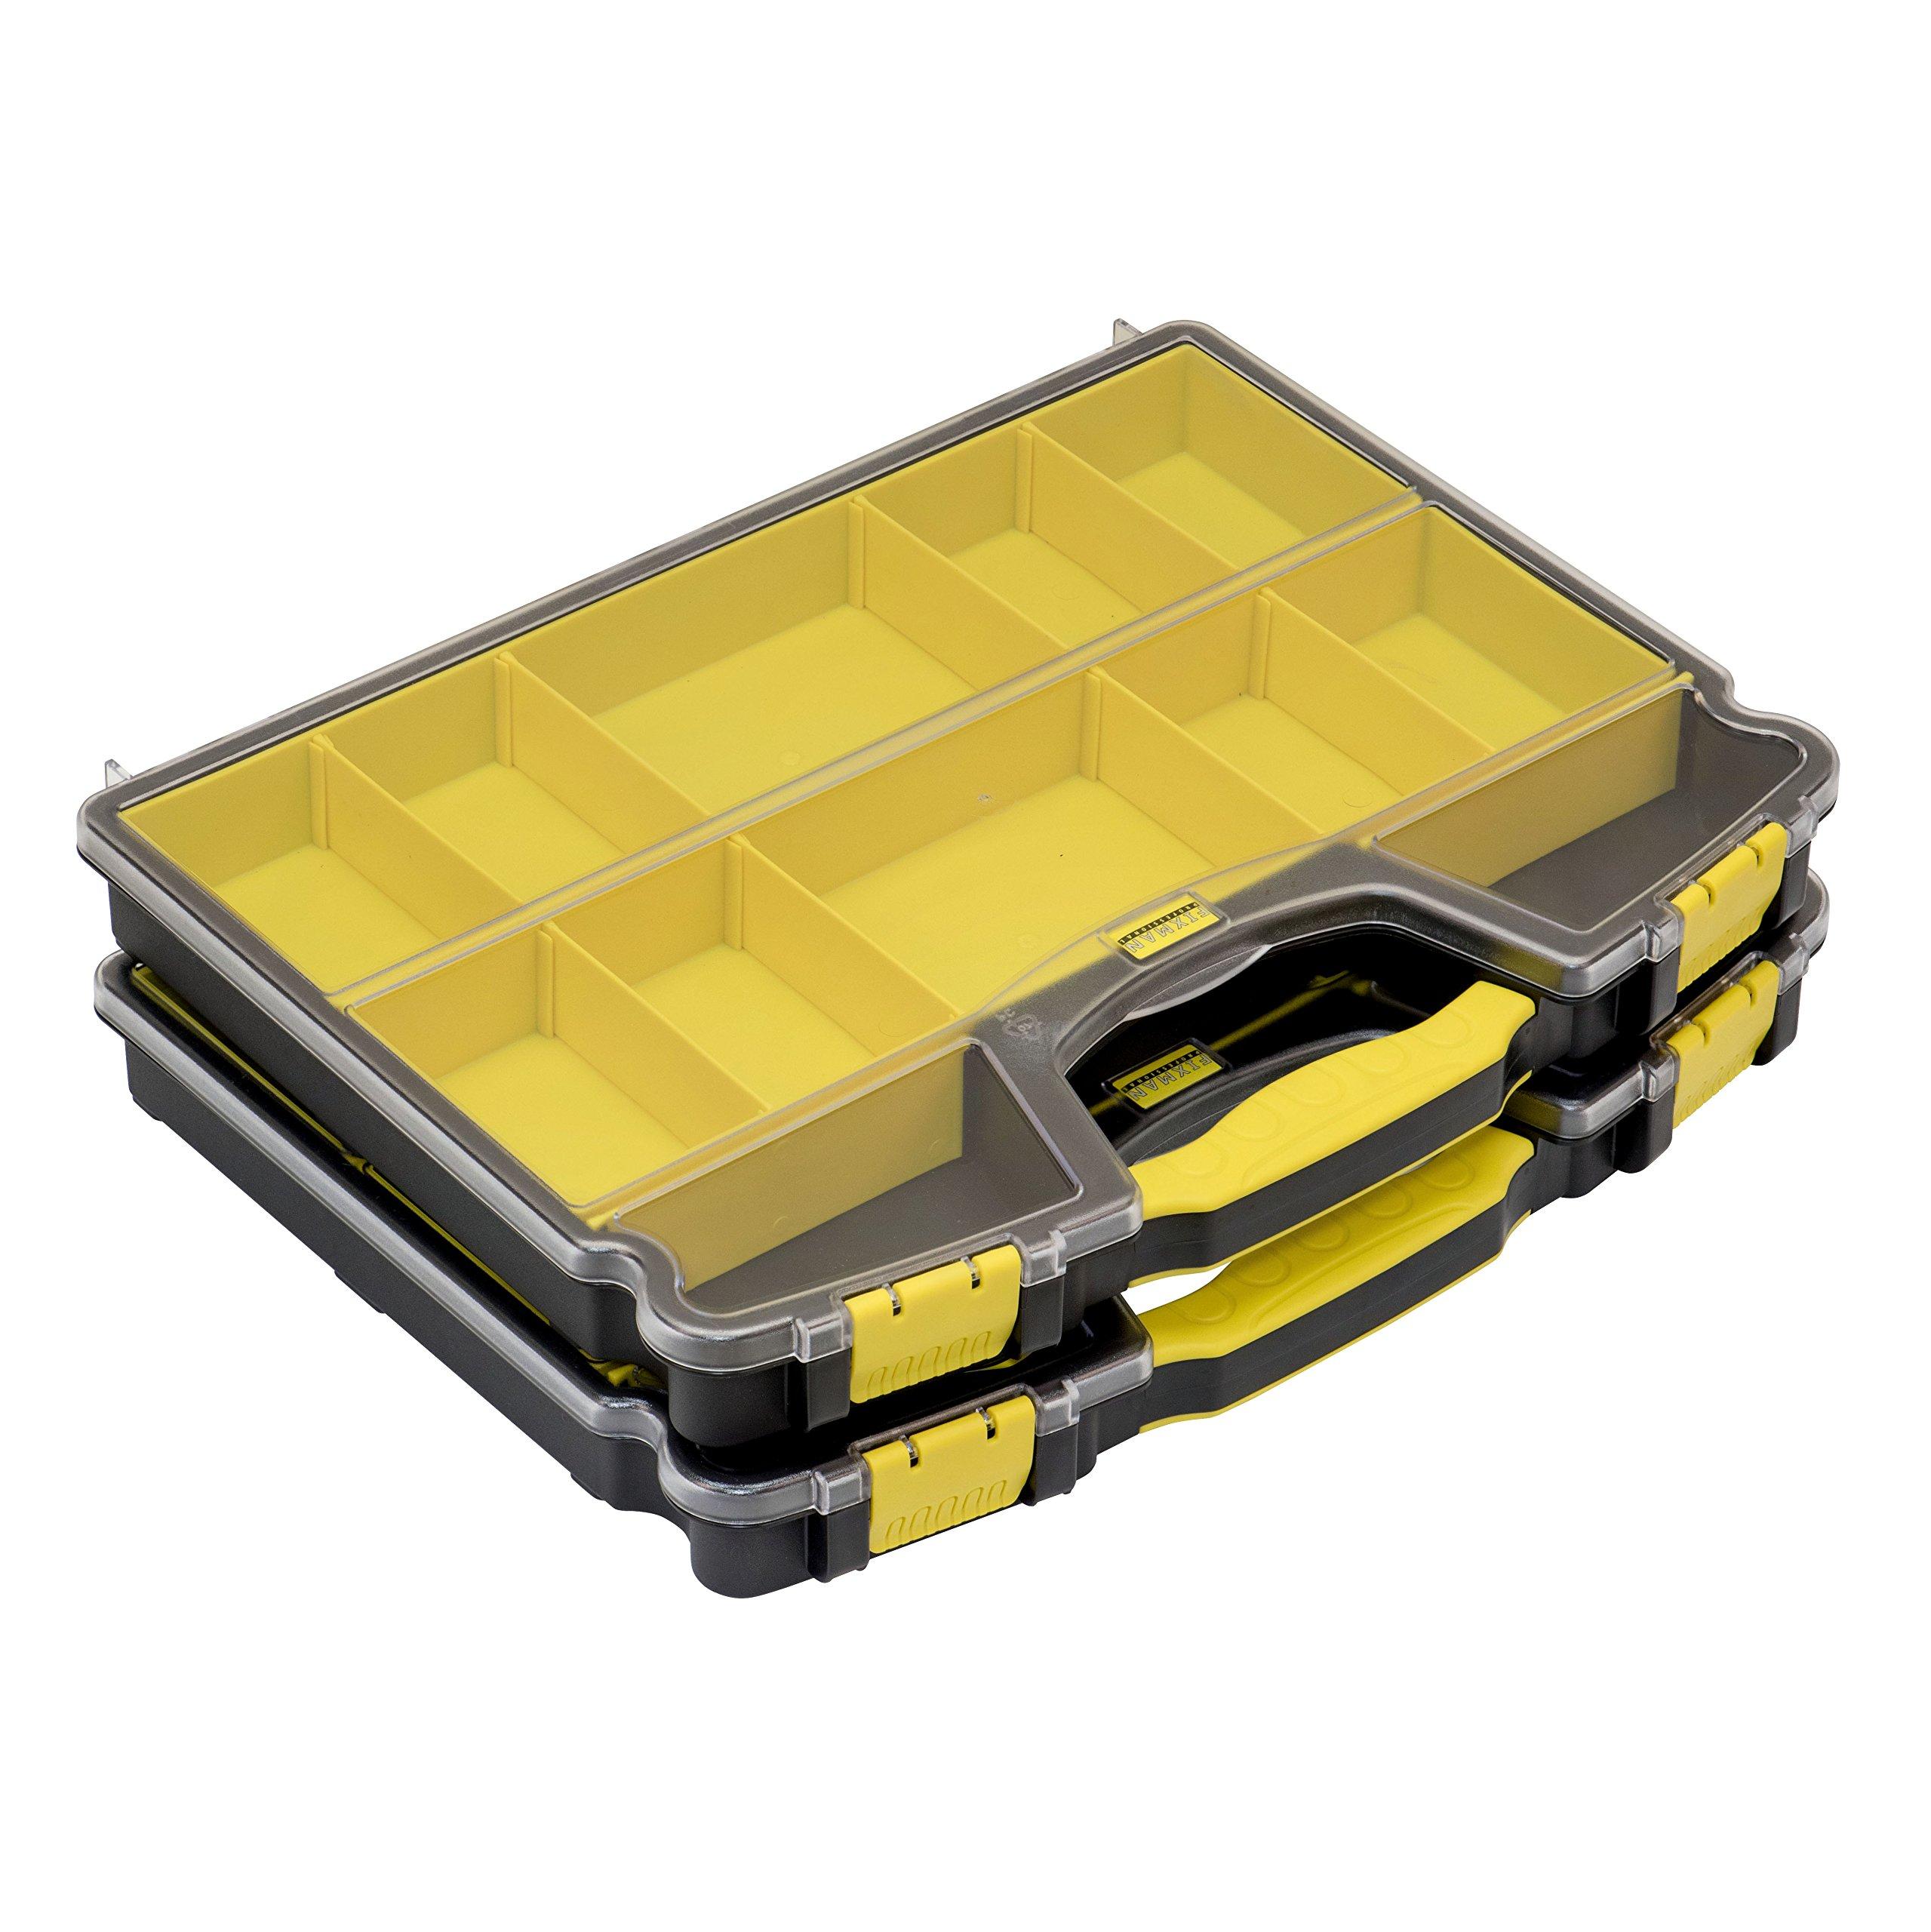 Trademark Tools 49024 12-Bin Organizer (2-Pack)